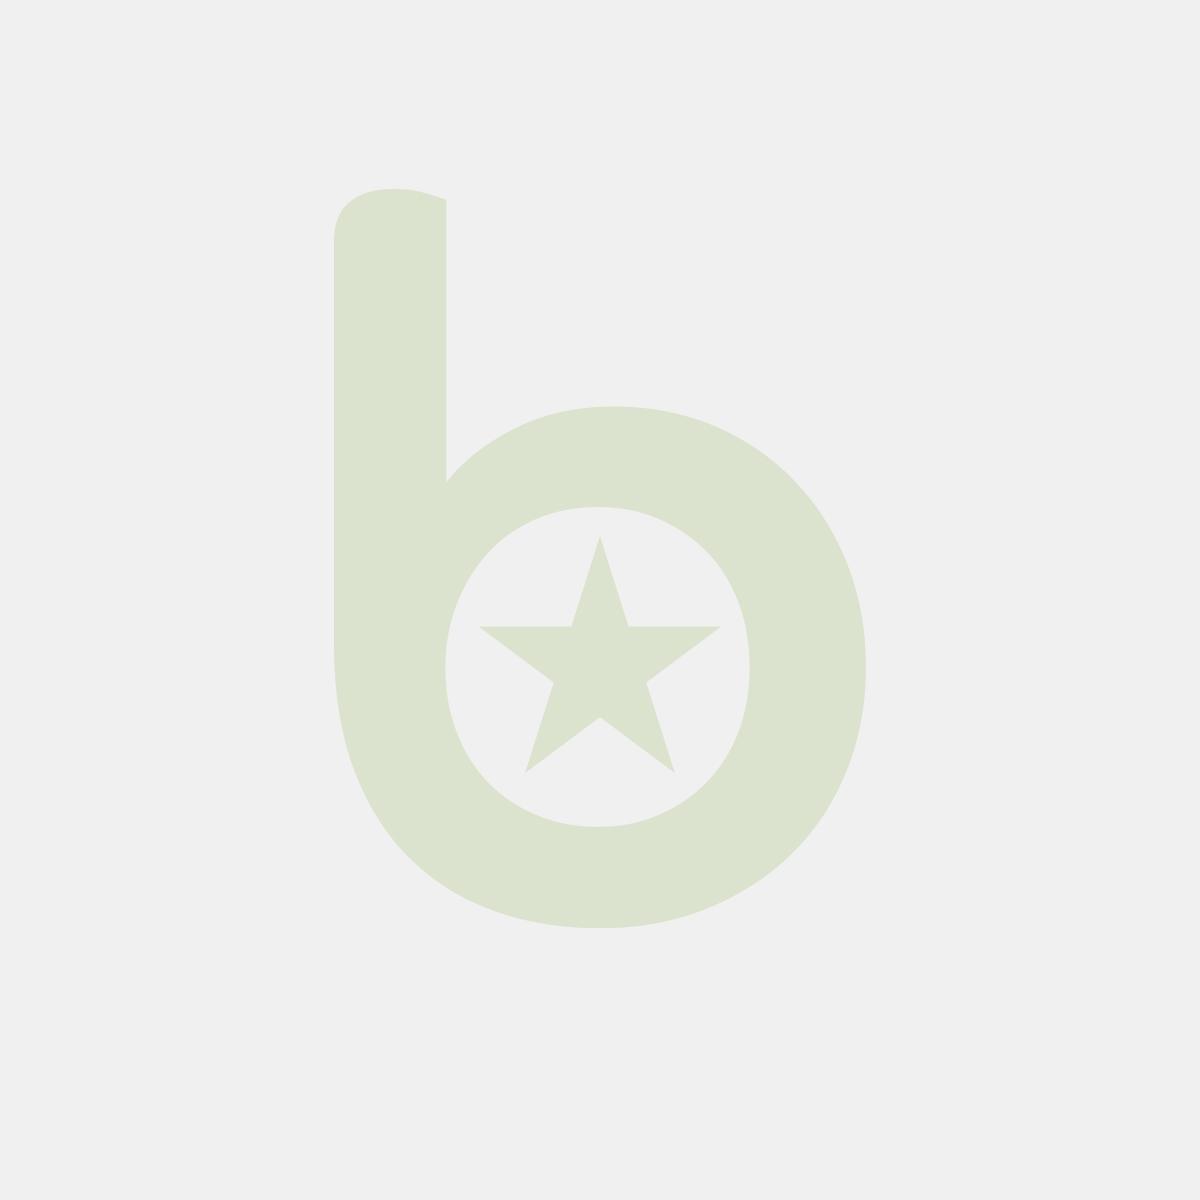 FINGERFOOD - pucharek PS czarny 7x6 cm op. 25 sztuk